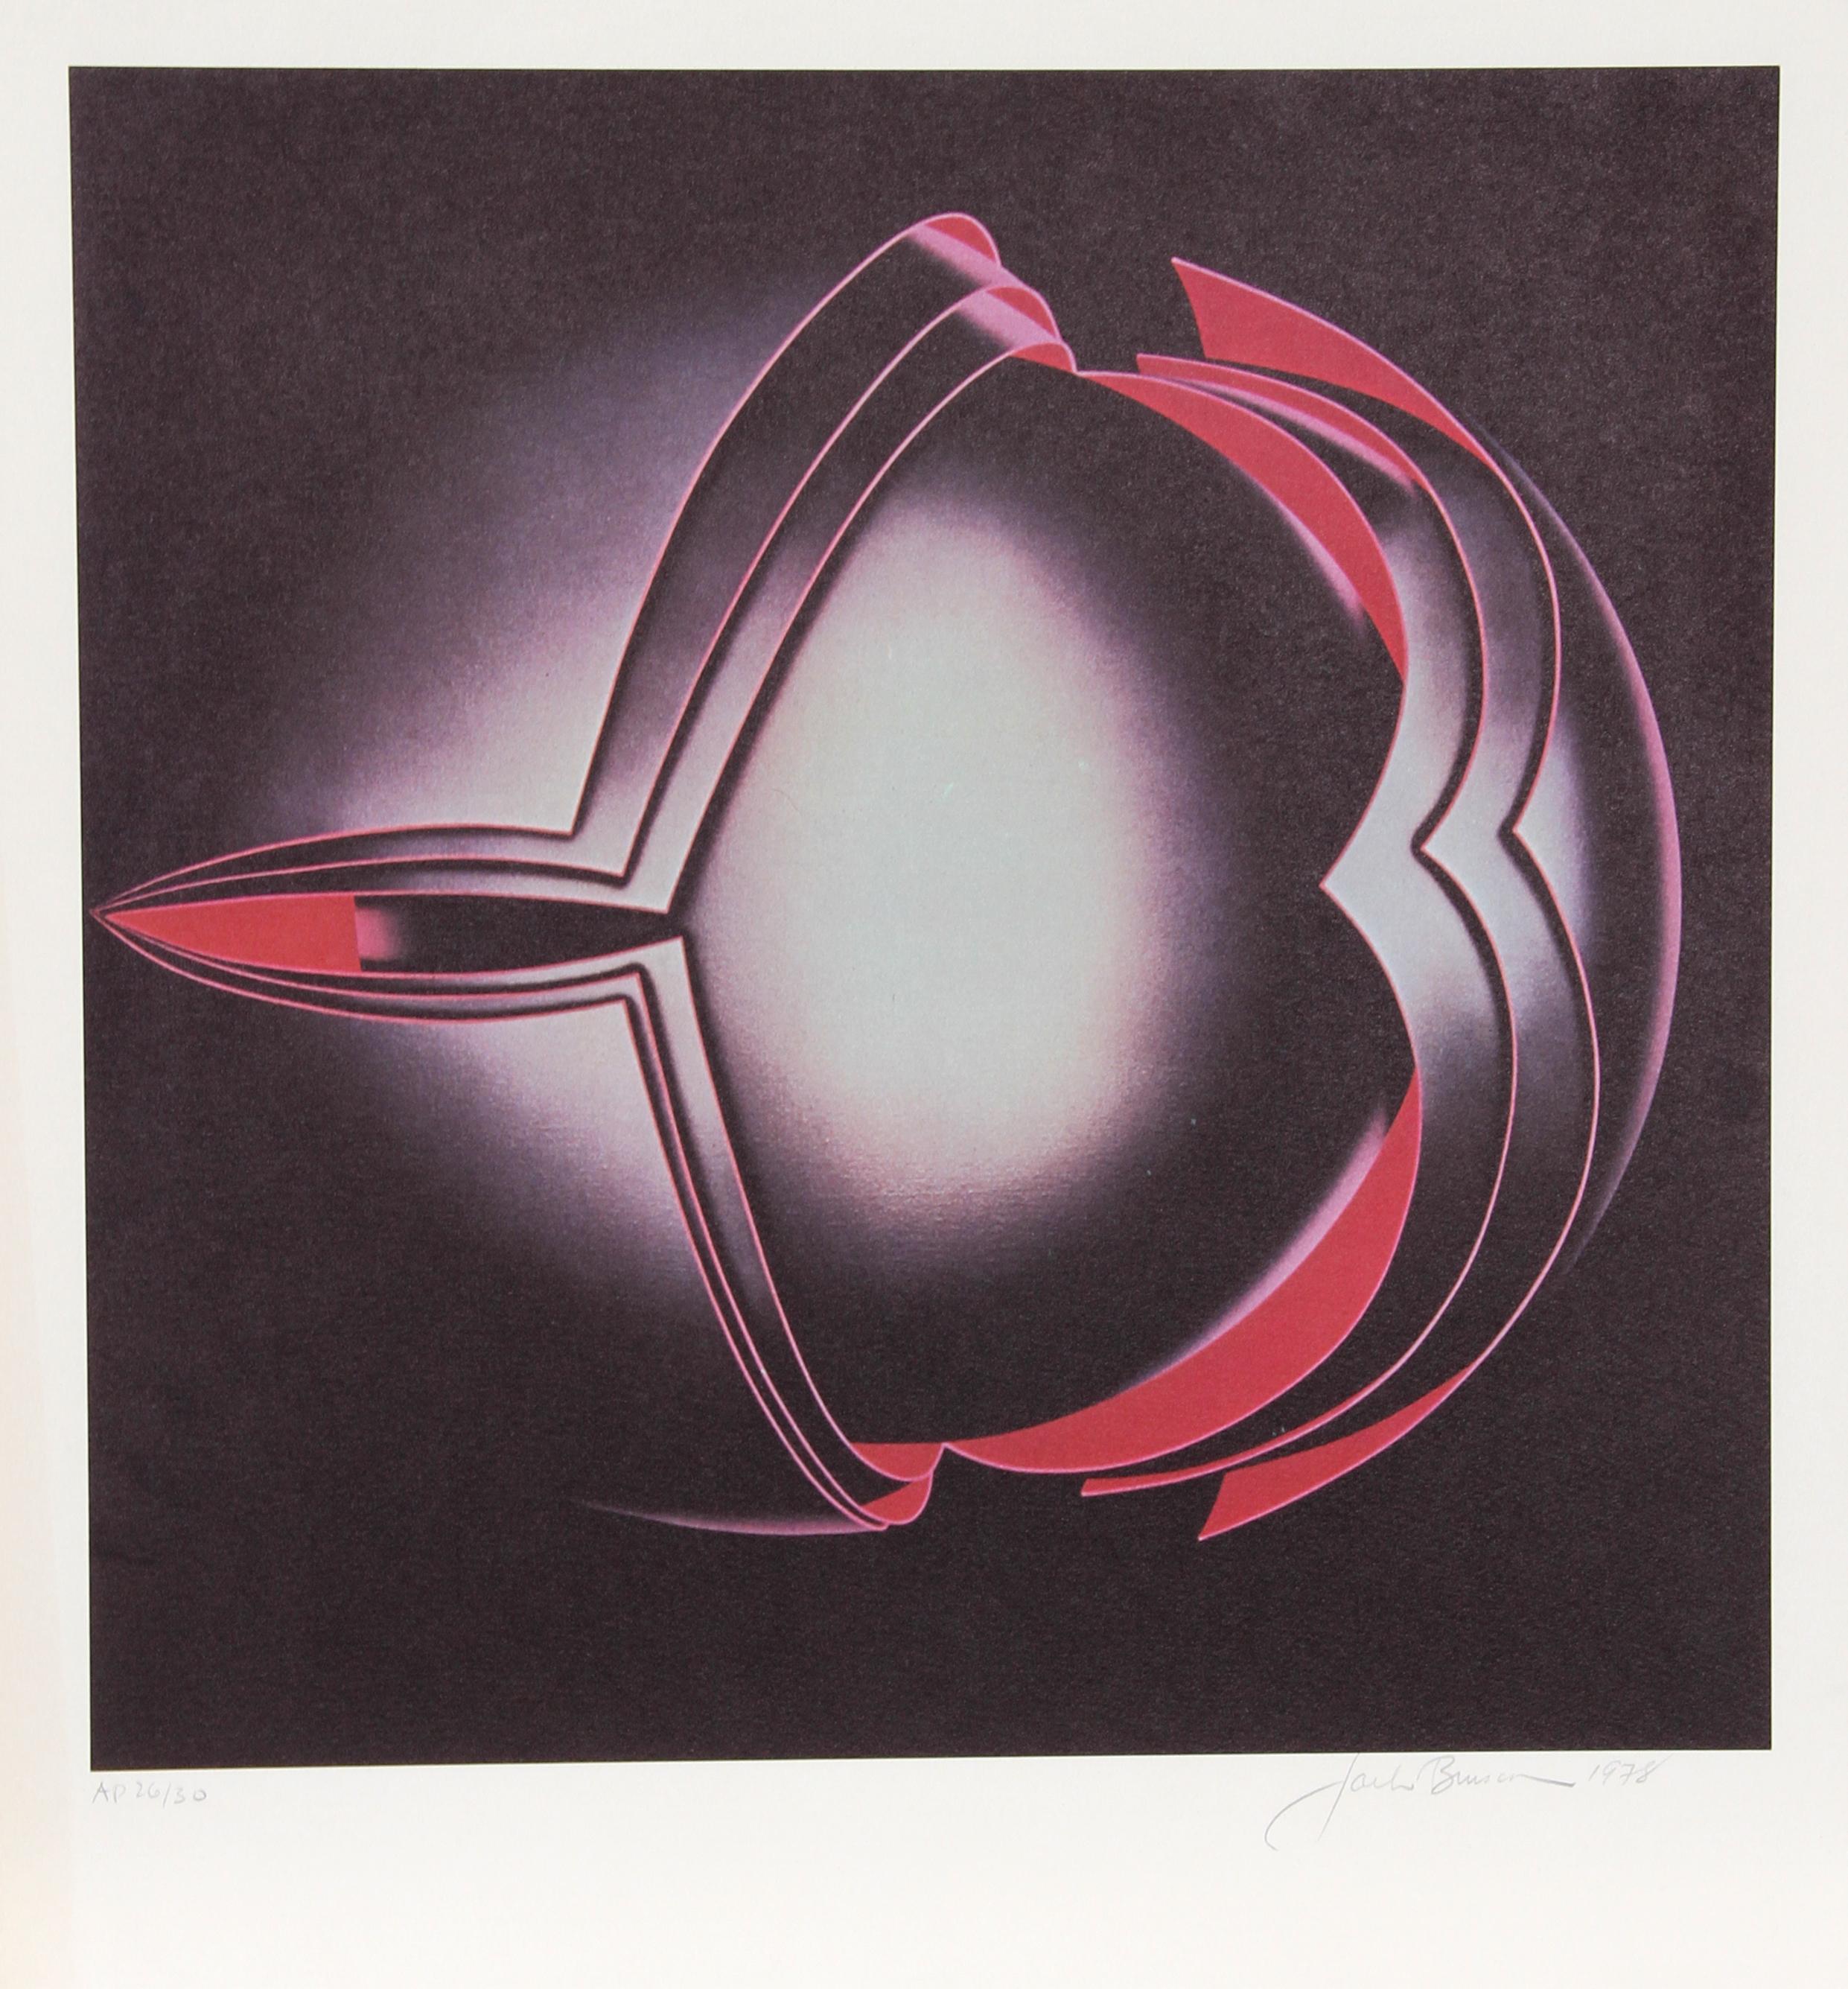 Diaz II, Op Art Silkscreen by Jack Brusca